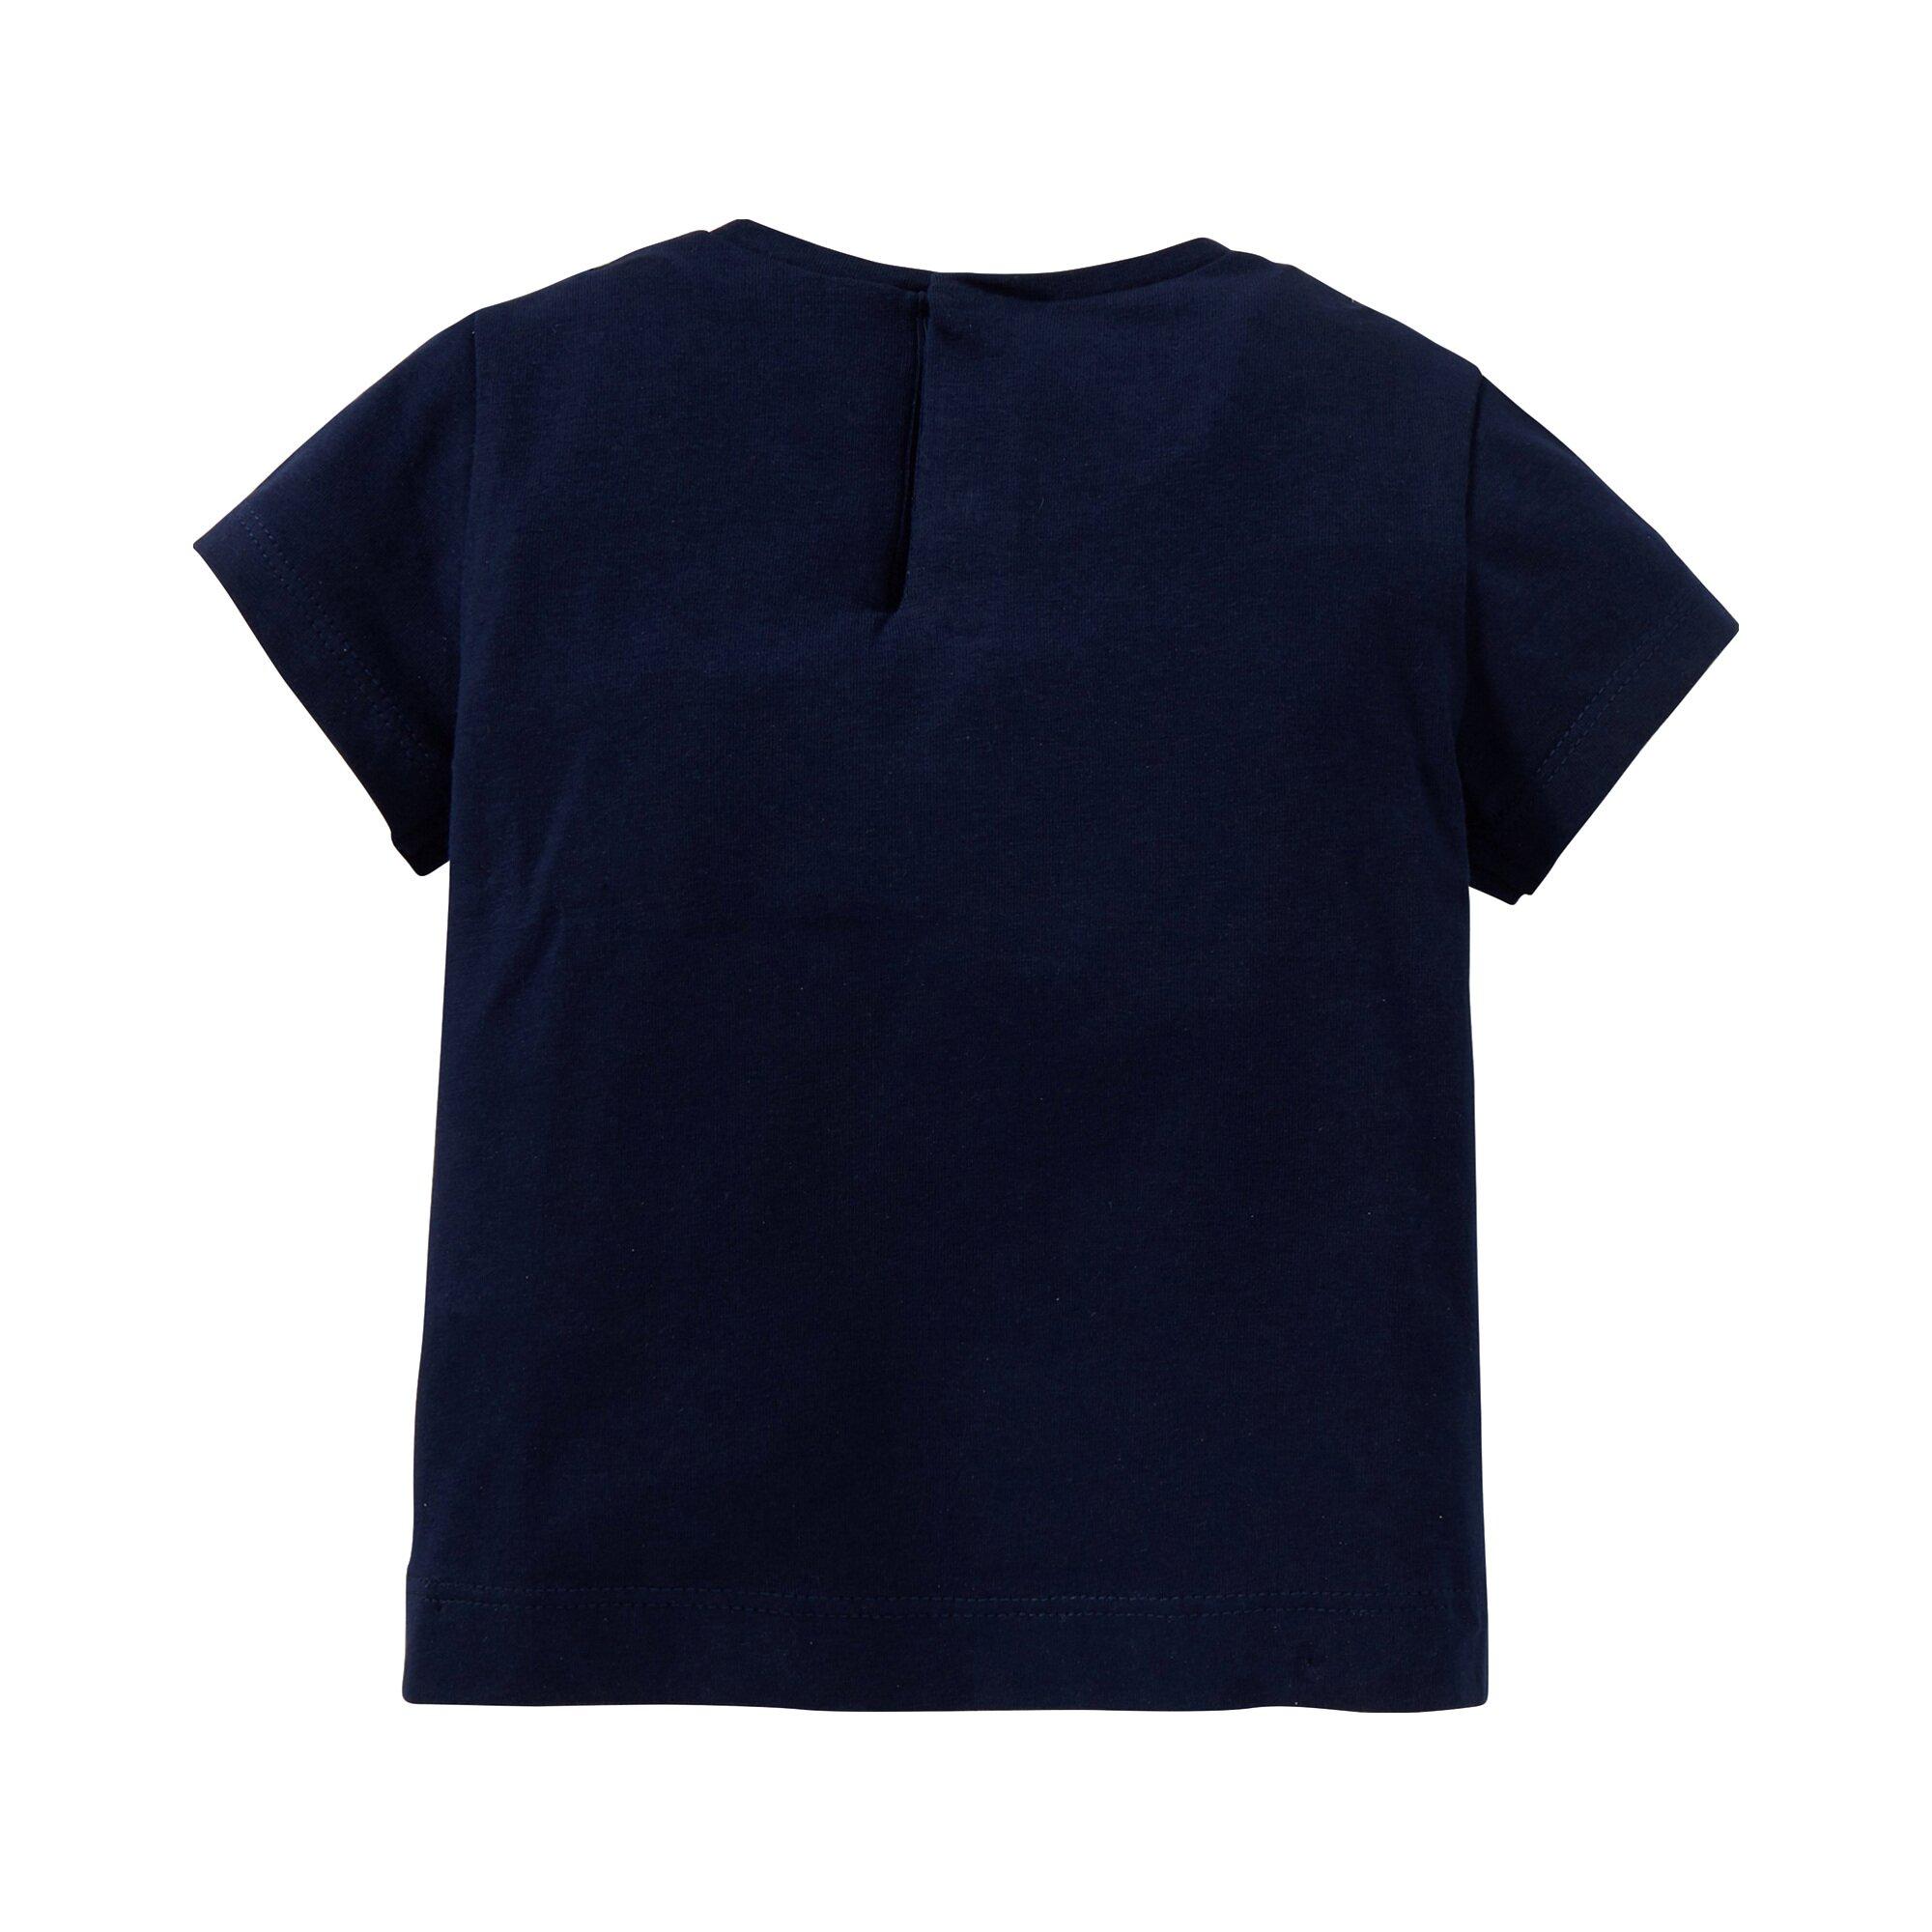 mayoral-t-shirt-blumen